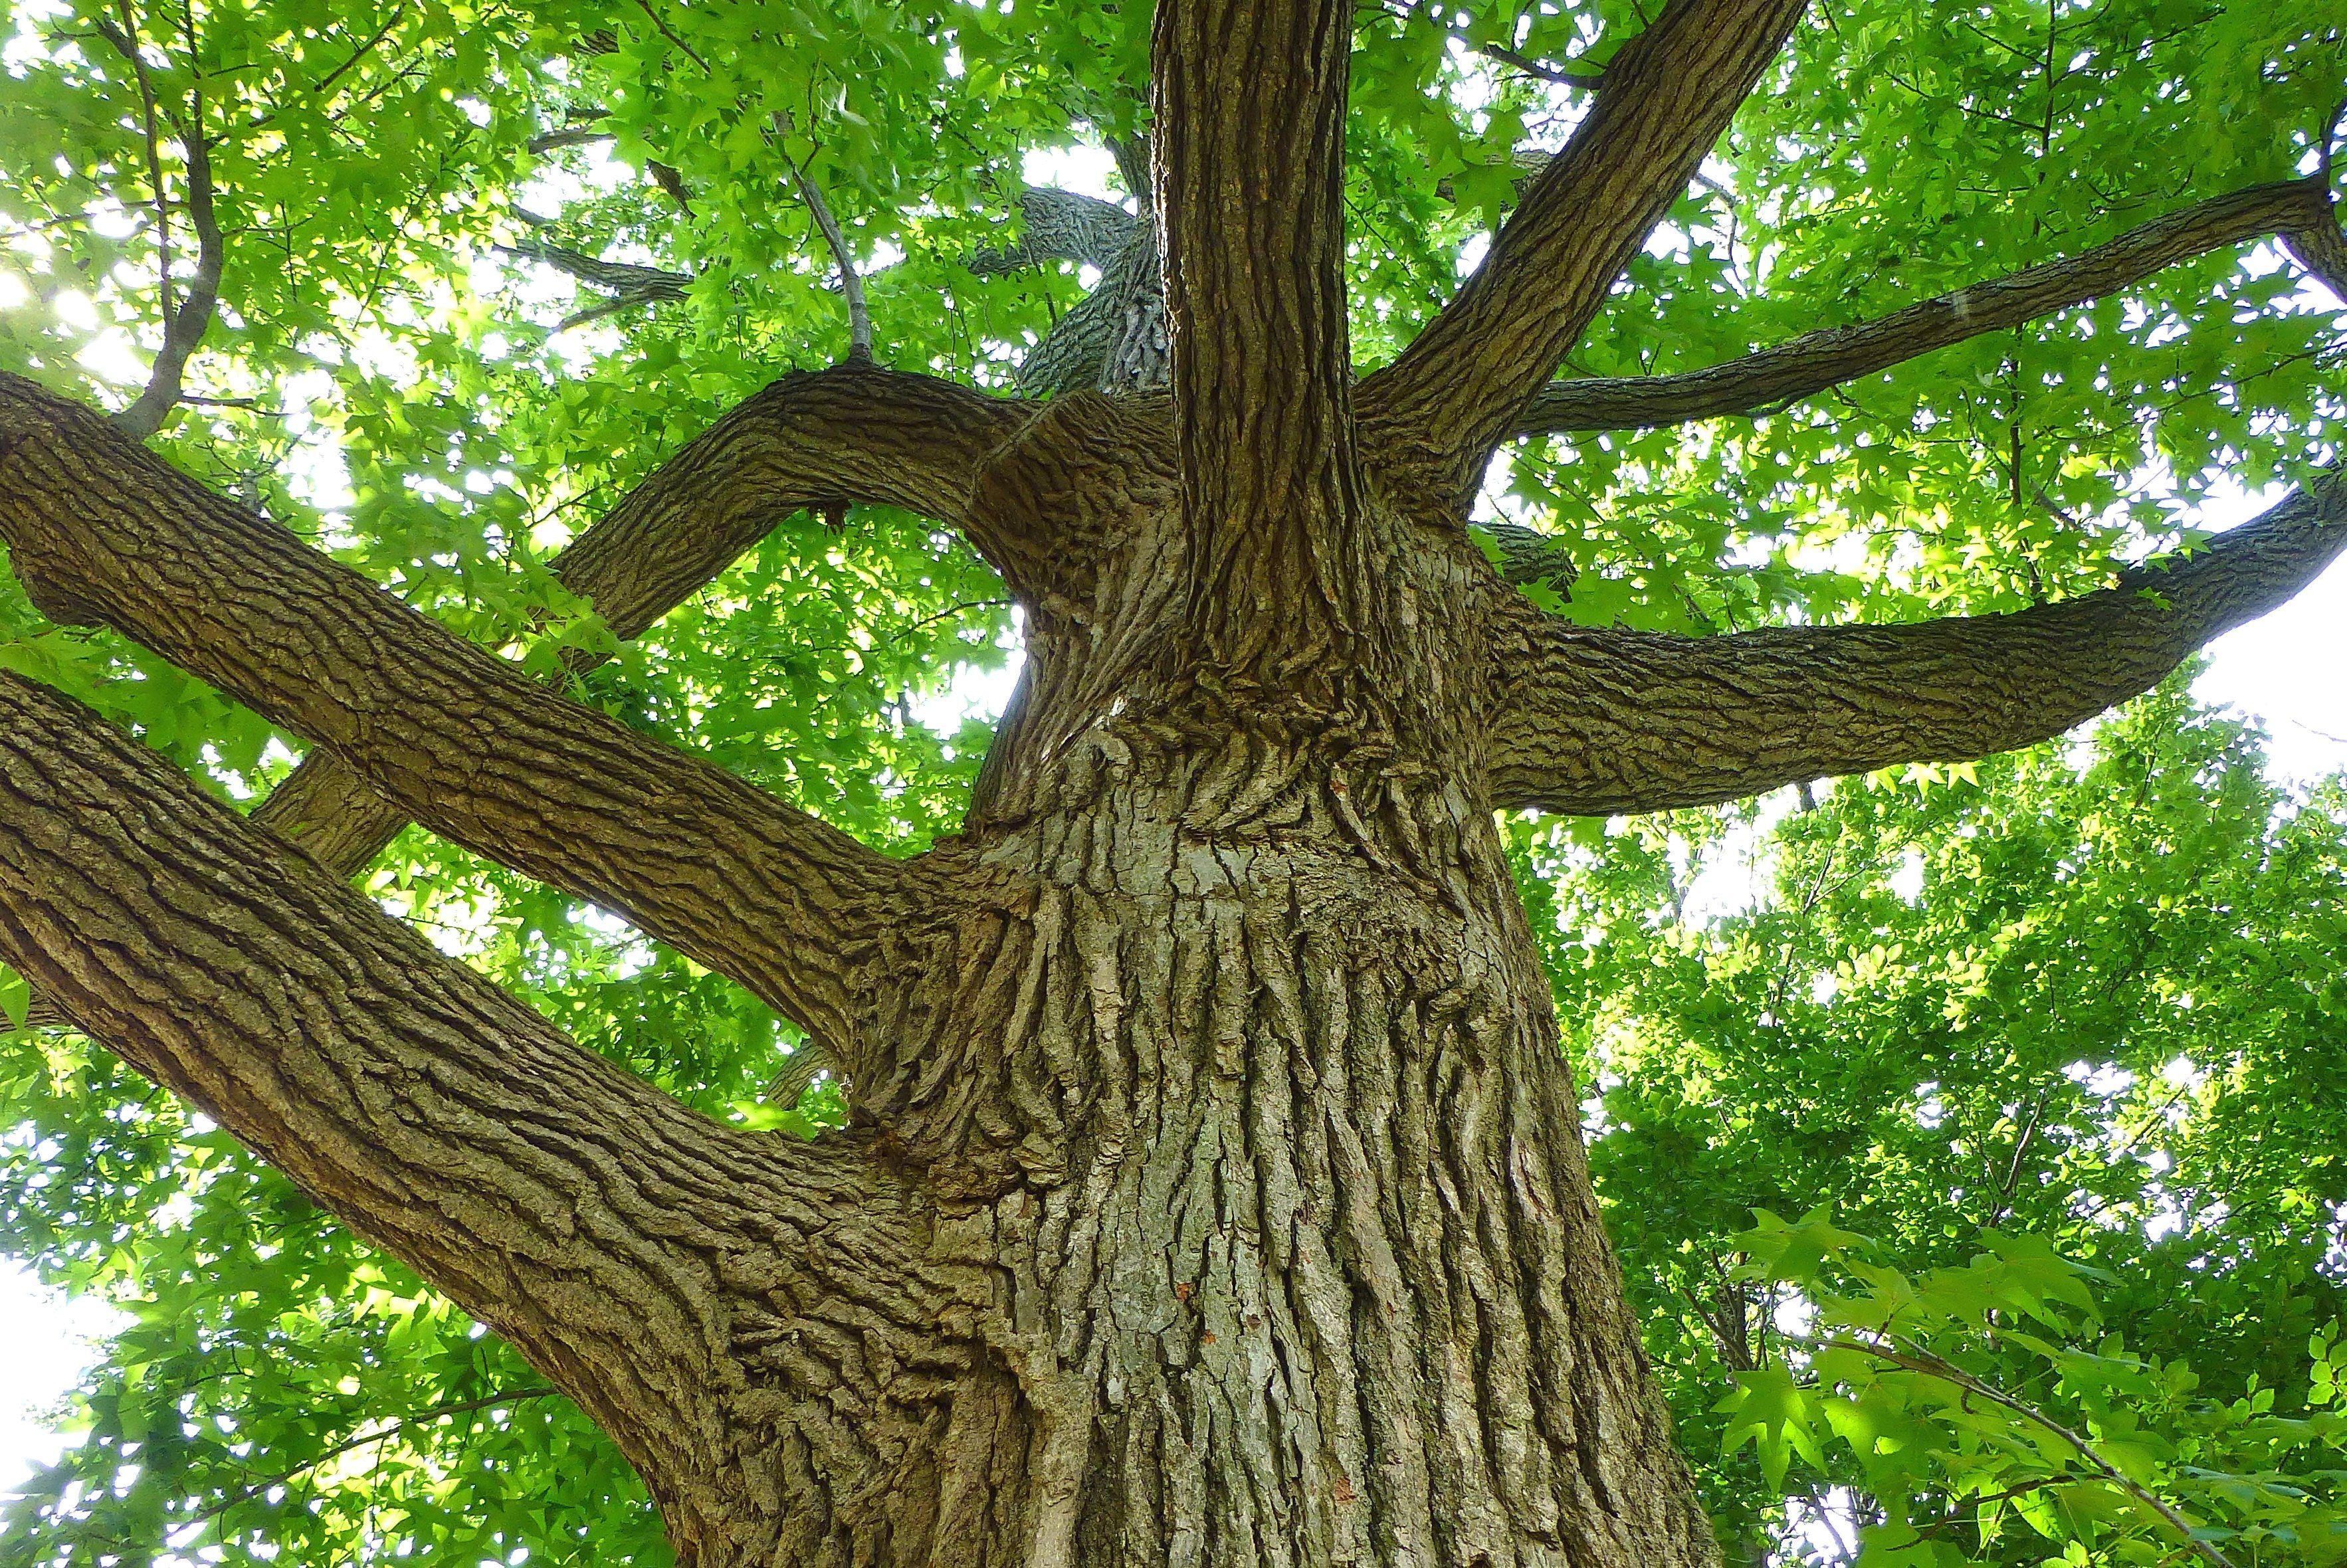 sweetgum tree with the alligator bark Garden plants